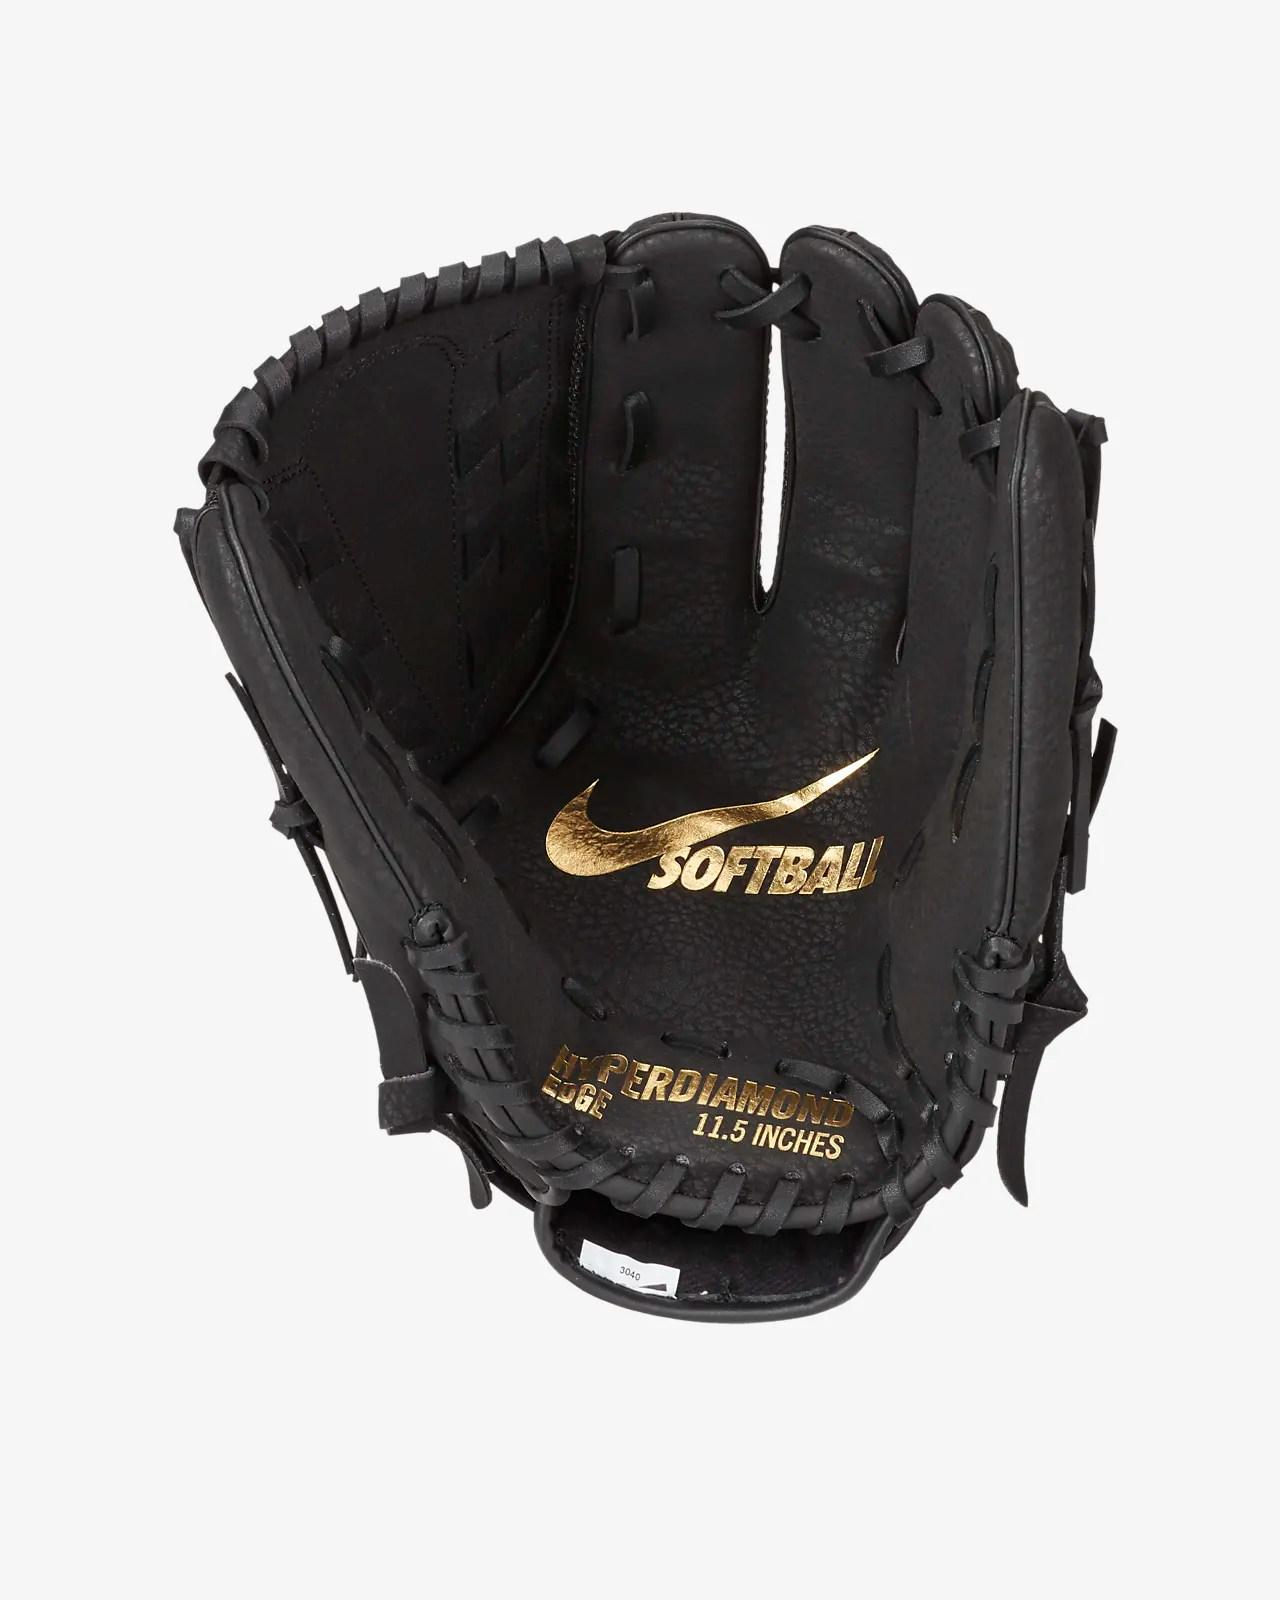 Glove Softball : glove, softball, Hyperdiamond, Kids', Softball, Fielding, Glove., Nike.com